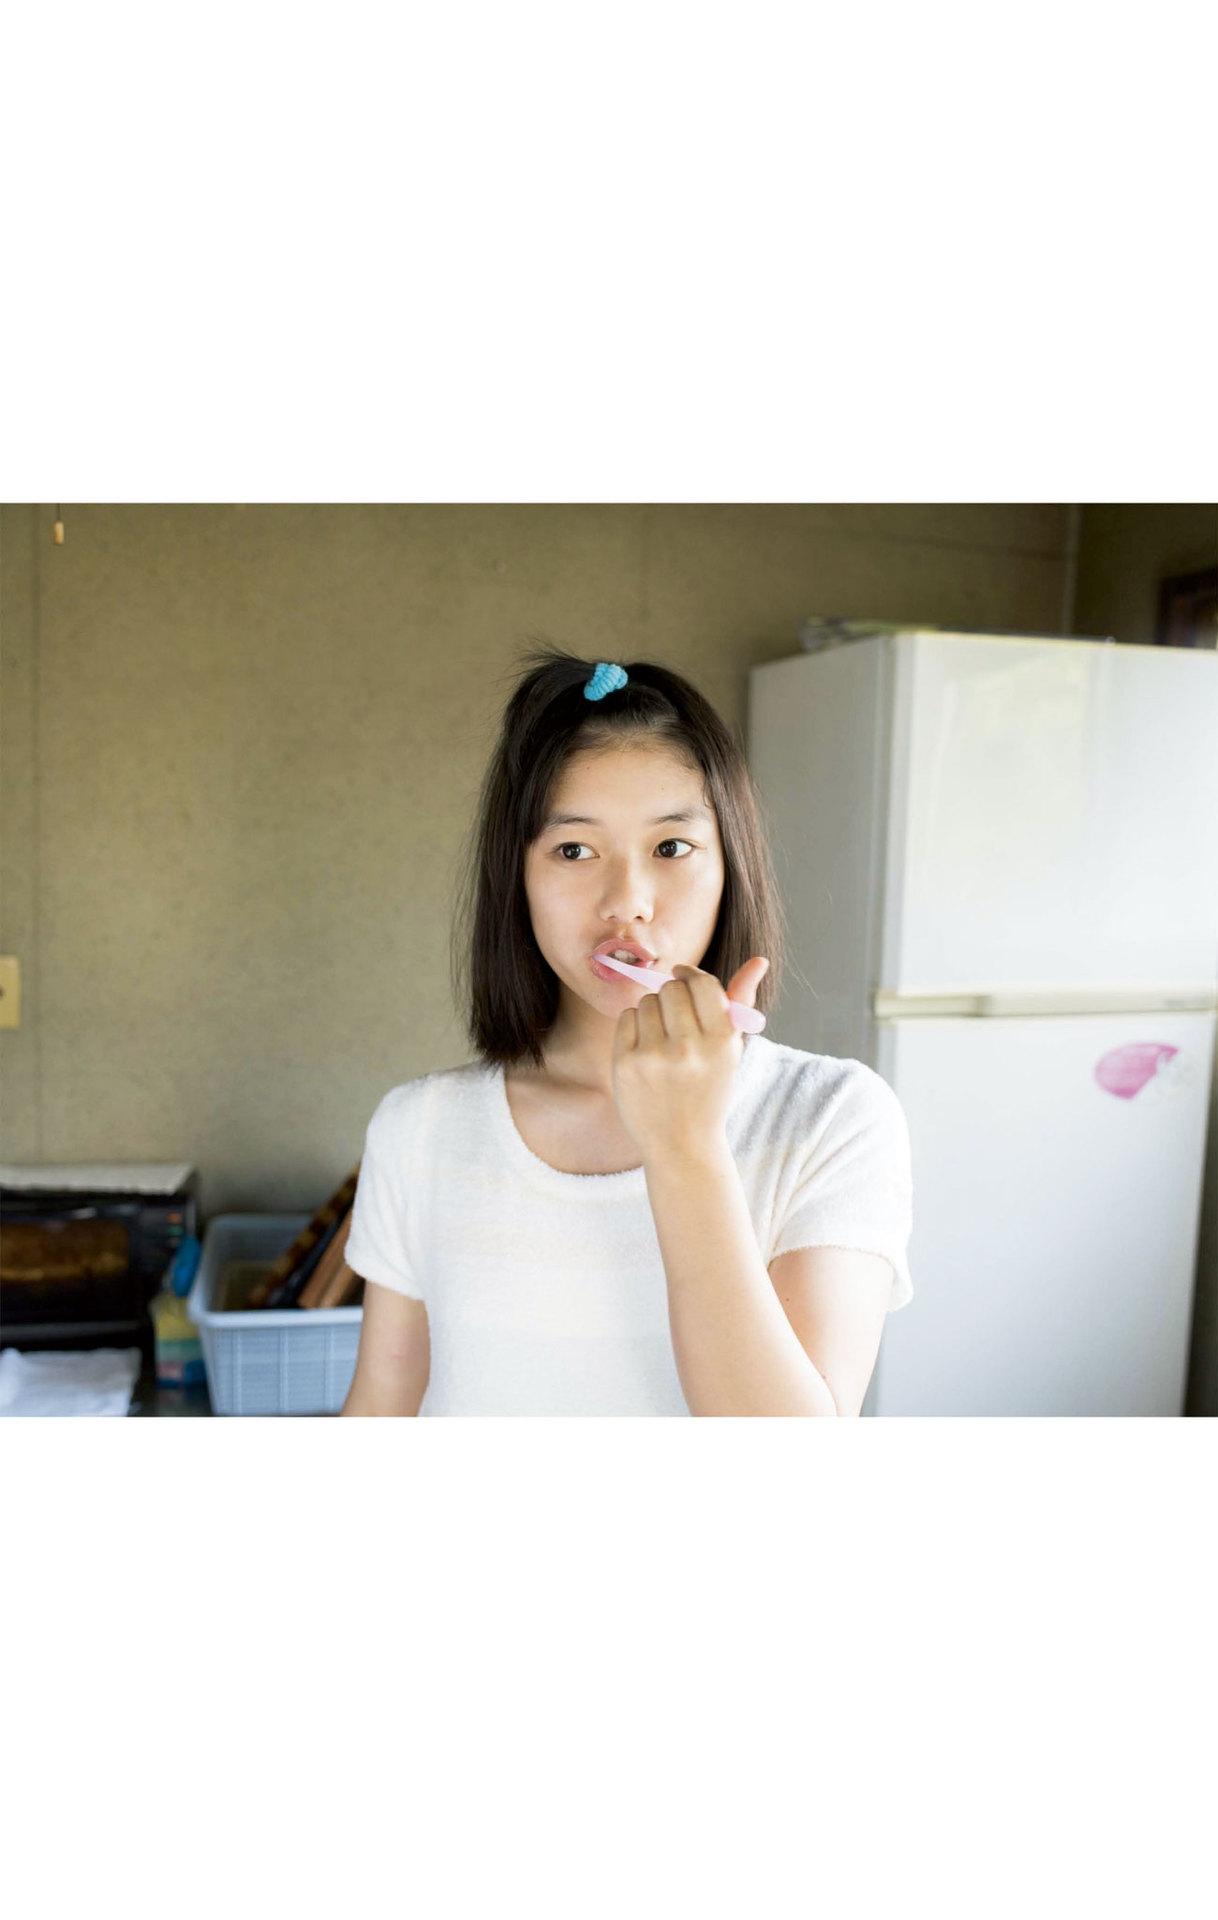 Summer Vacation Uniform After School Youth Bikini011